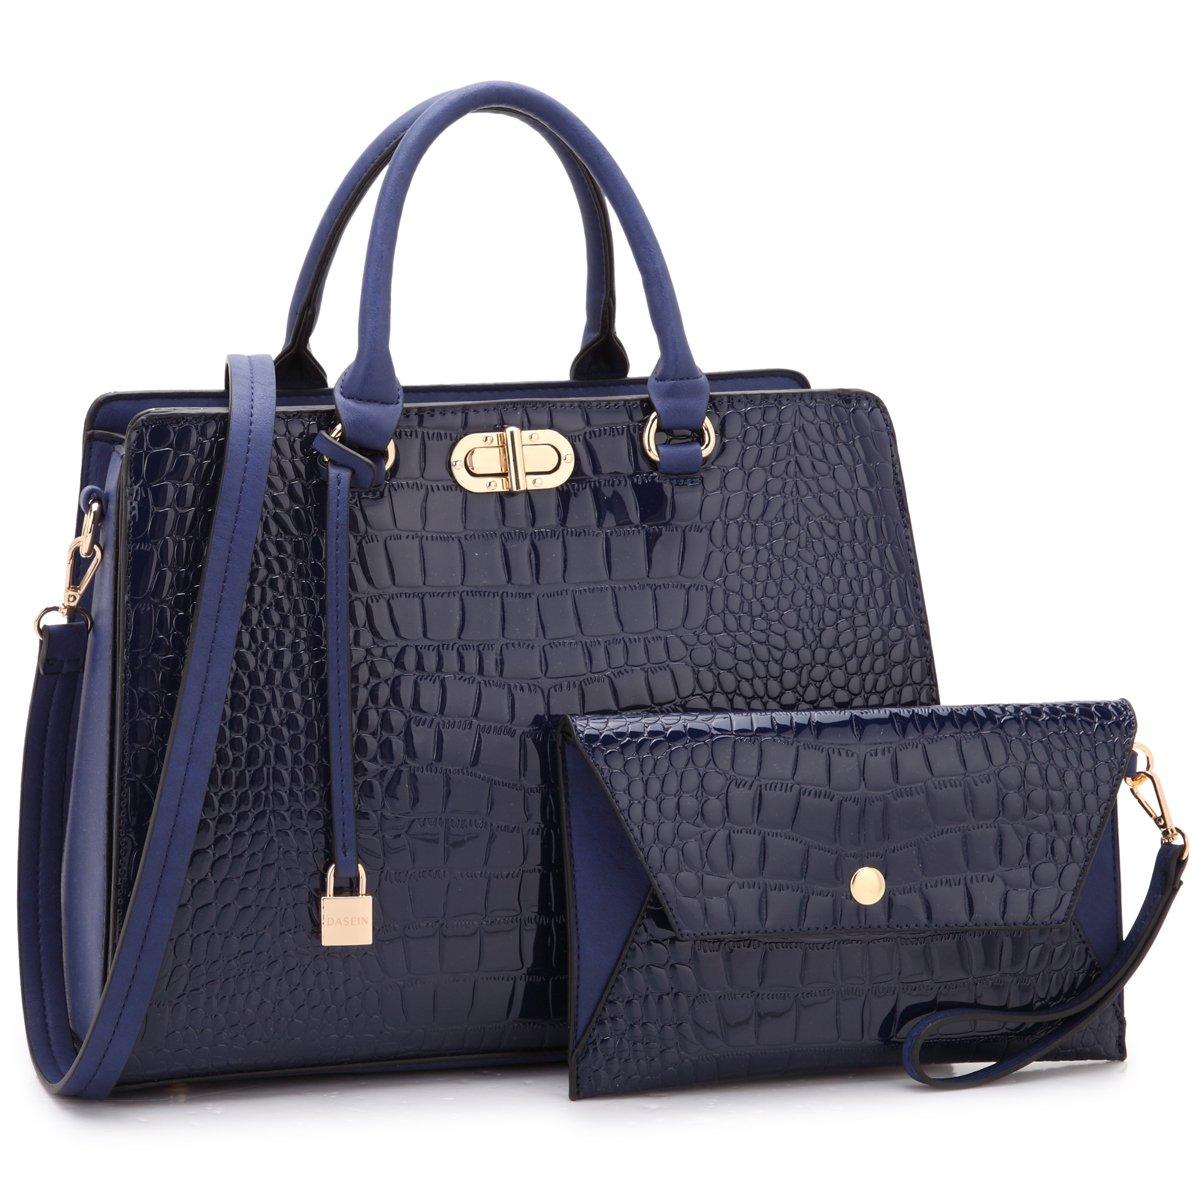 Croco Leatherbluee 1988 MMK Collection Women's Satchel Handbag Vegan Leather Medium SizeDesigner Handbags for Women